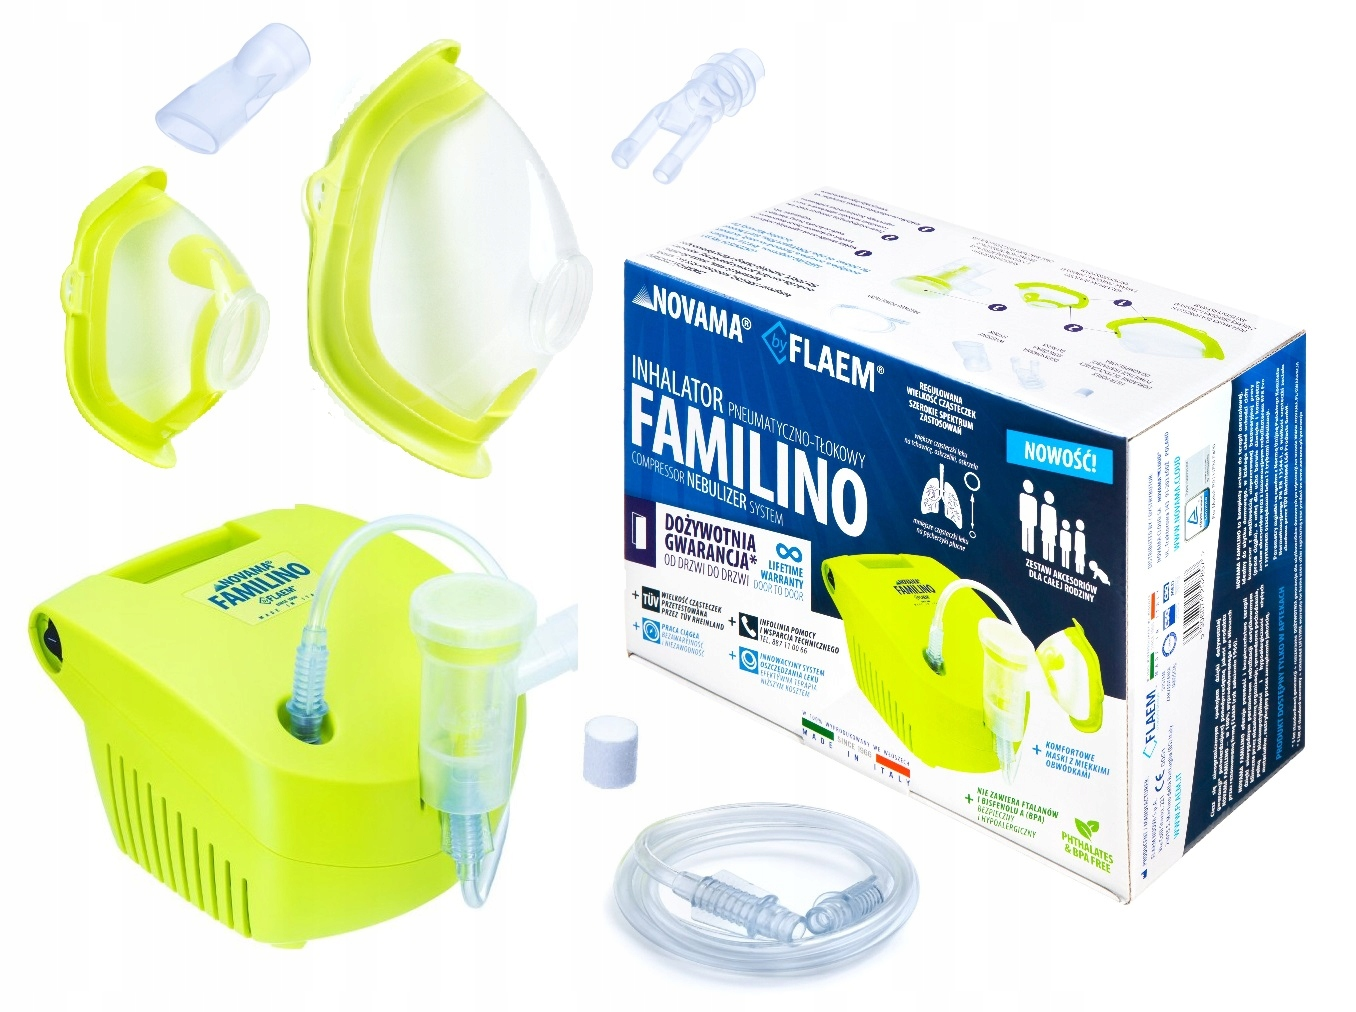 Inhalator nebulizator tłokowy NOVAMA FAMILINO